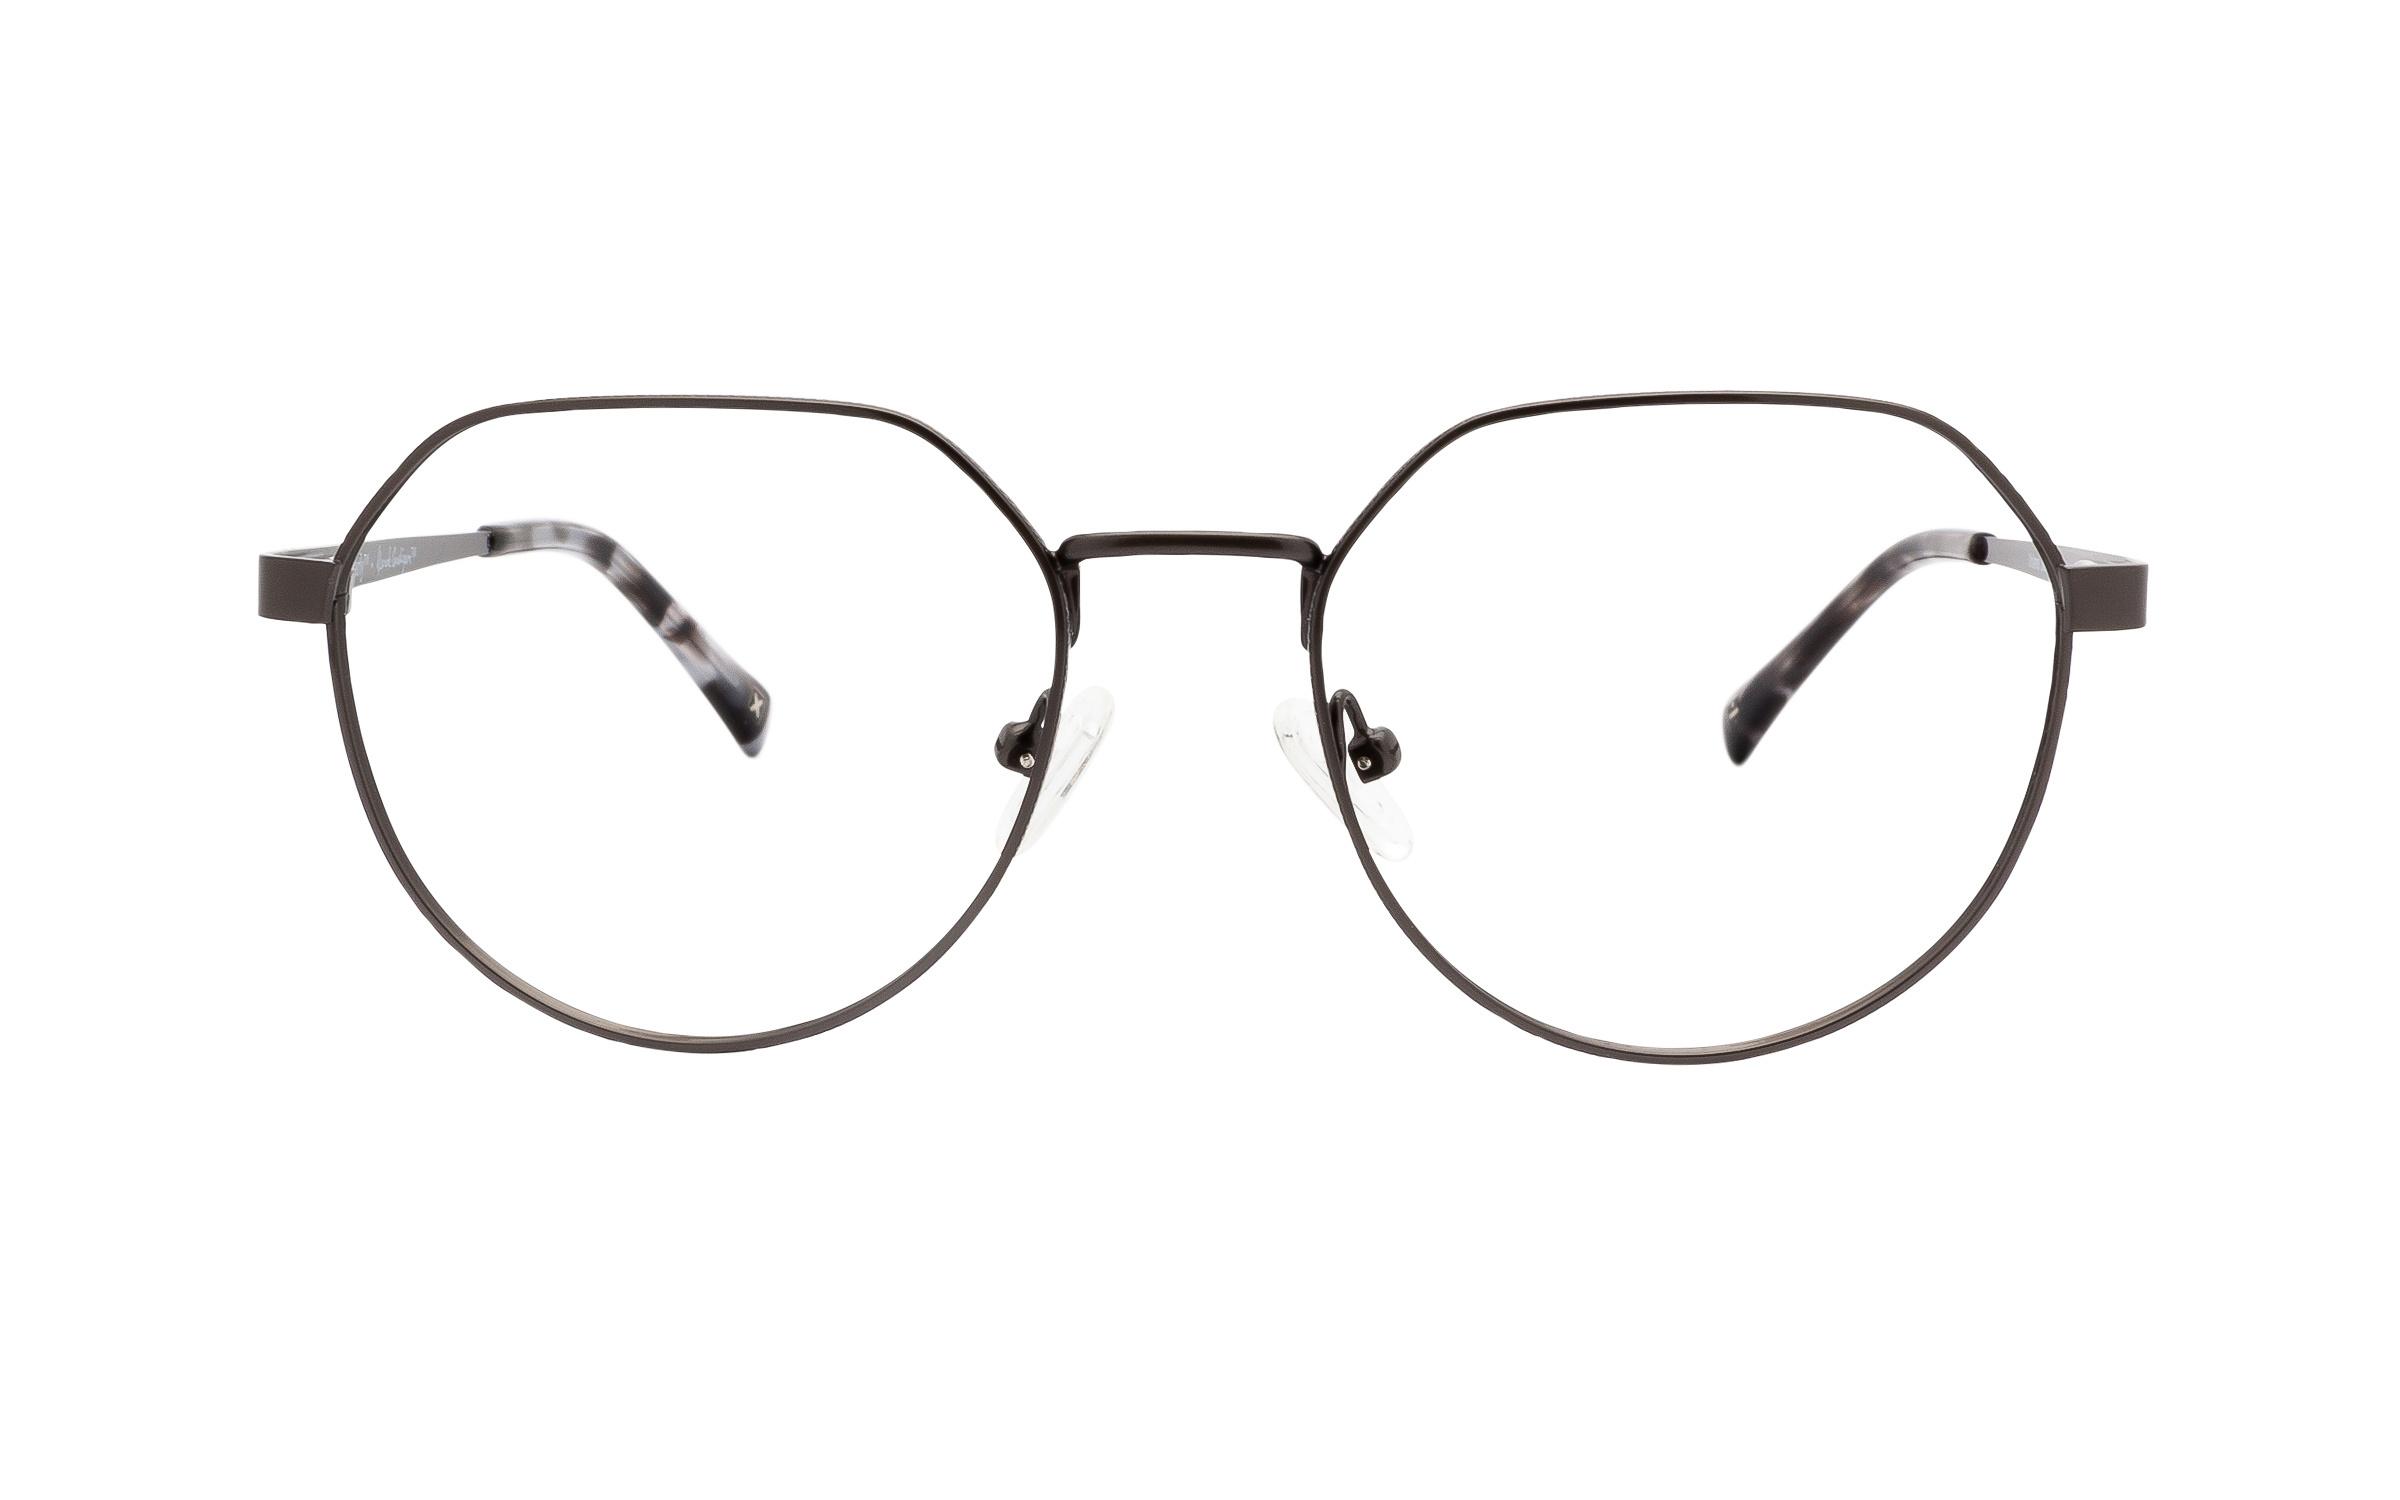 http://www.coastal.com/ - Derek Cardigan Volans DC229 C03 (51) Eyeglasses and Frame in Satin Gun Grey | Metal – Online Coastal